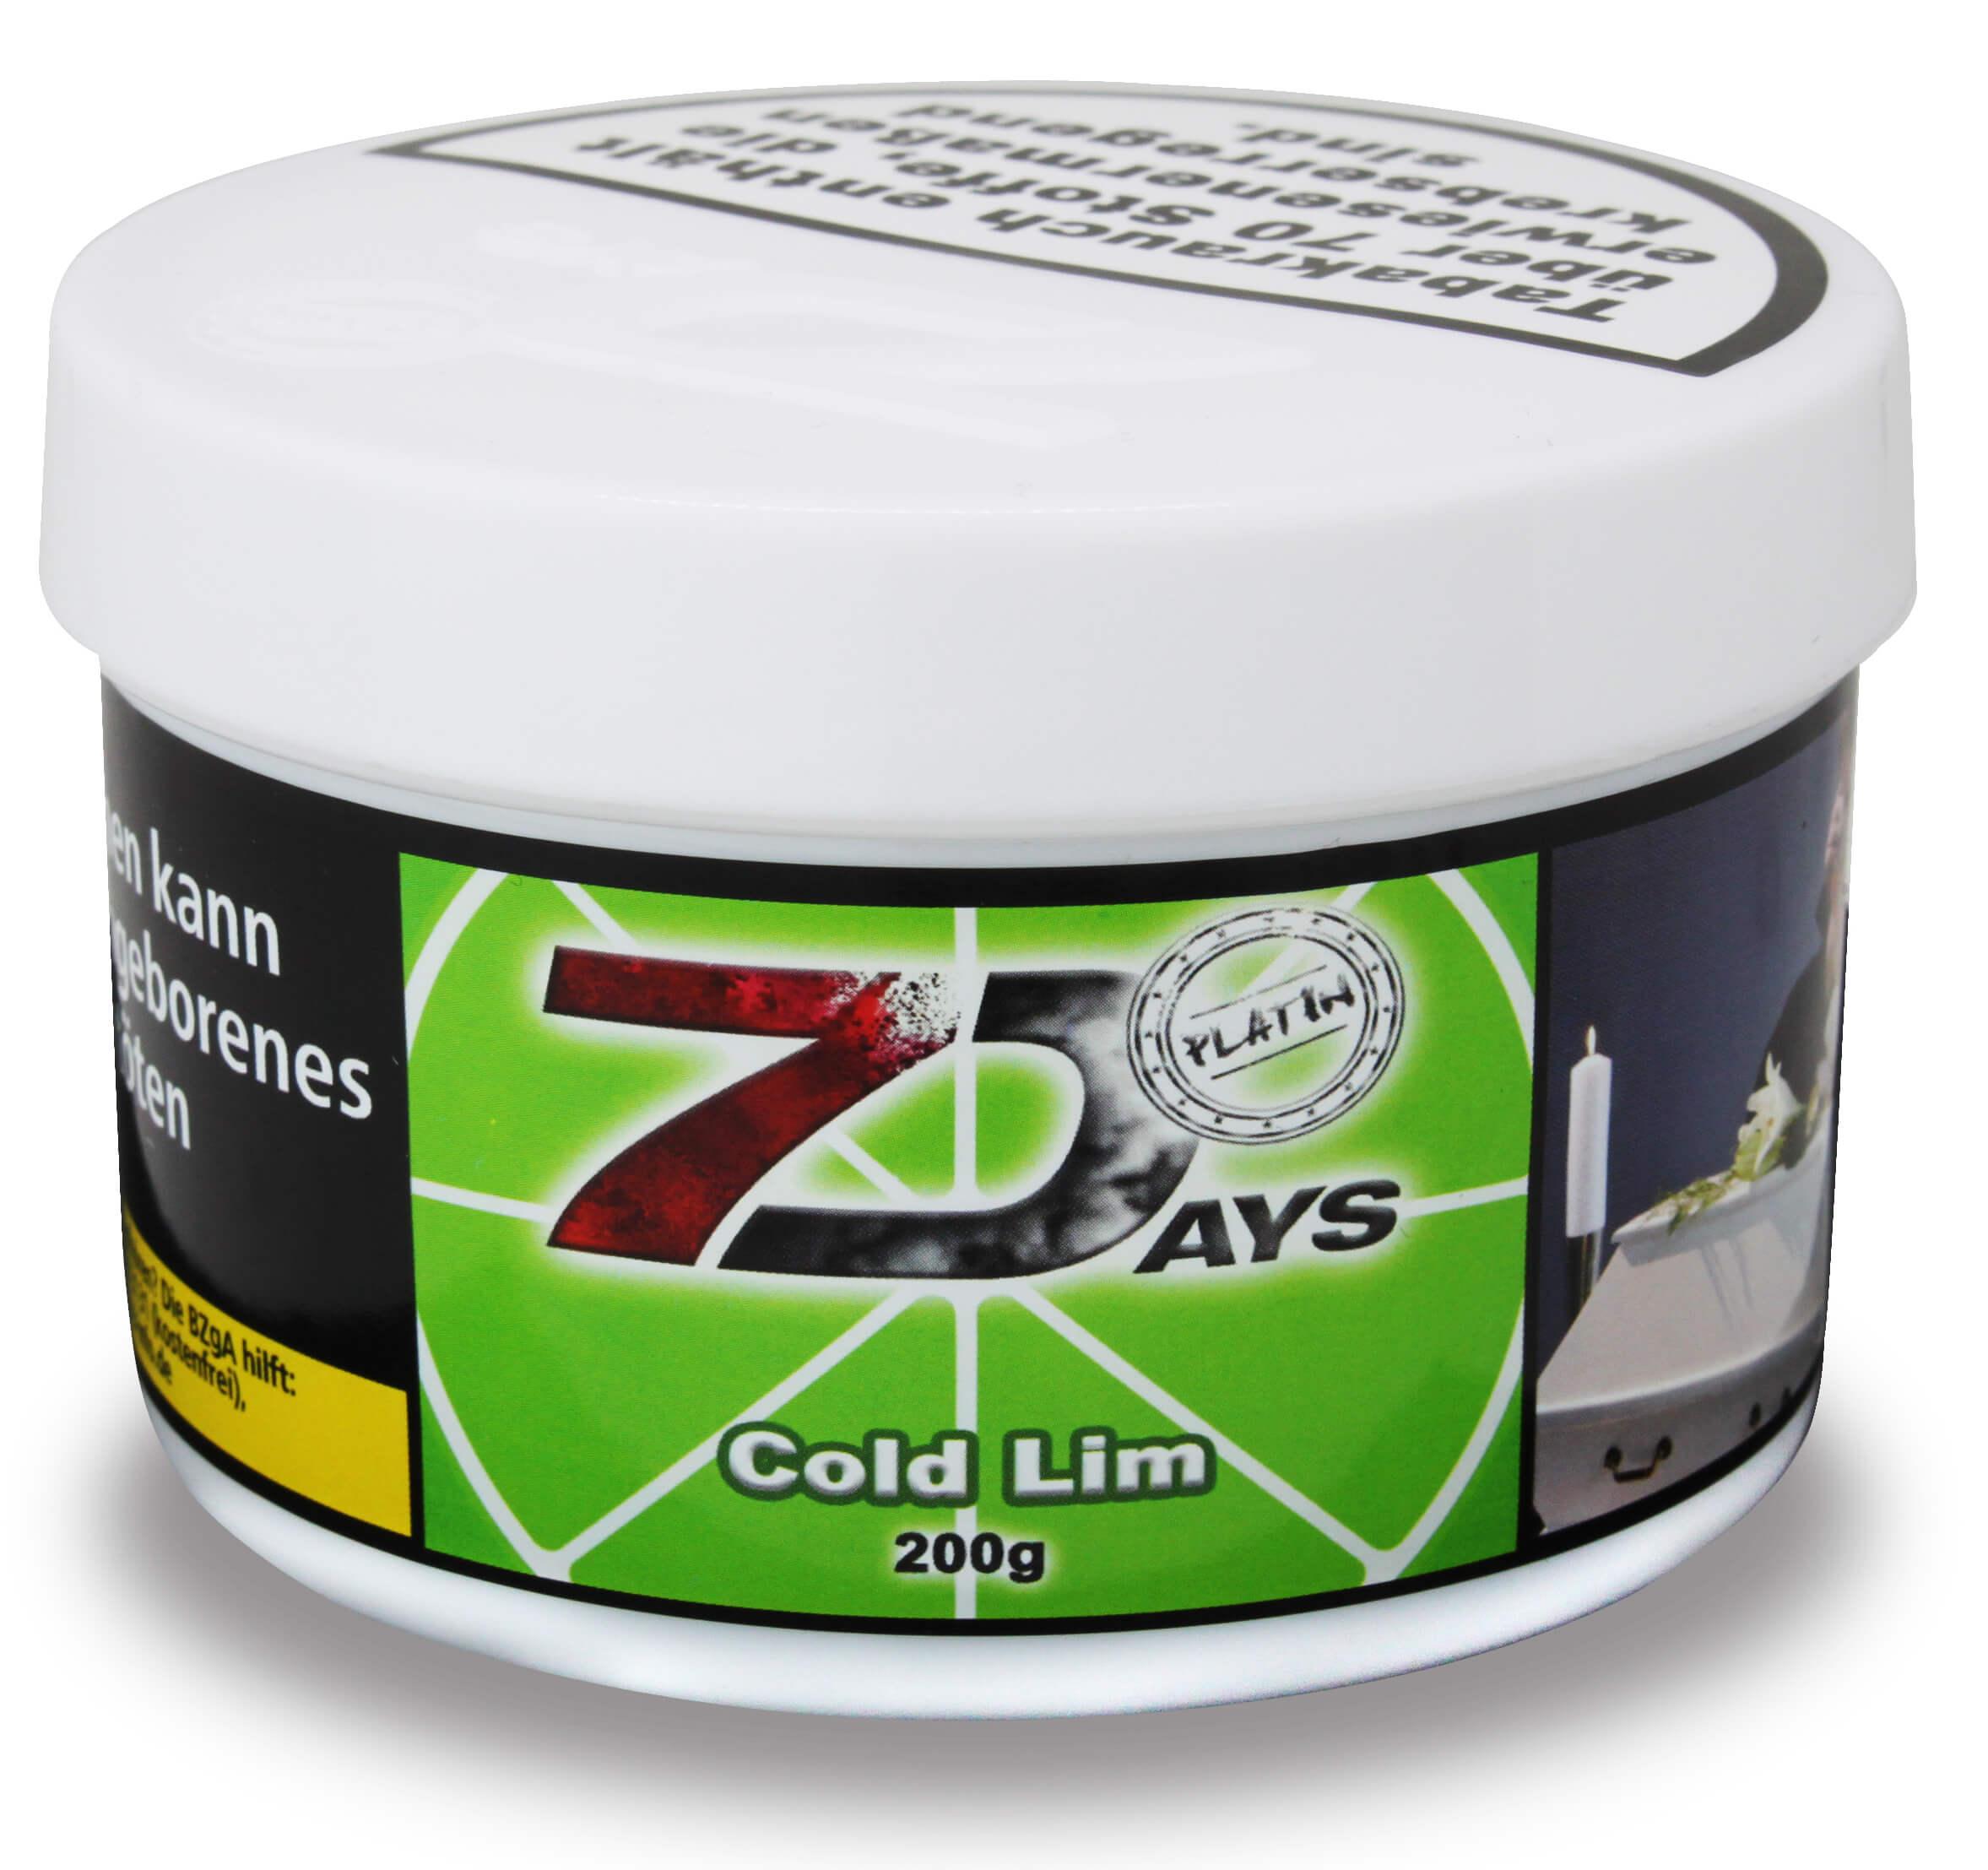 7 Days Platin Tabak - Cold Lim 200g